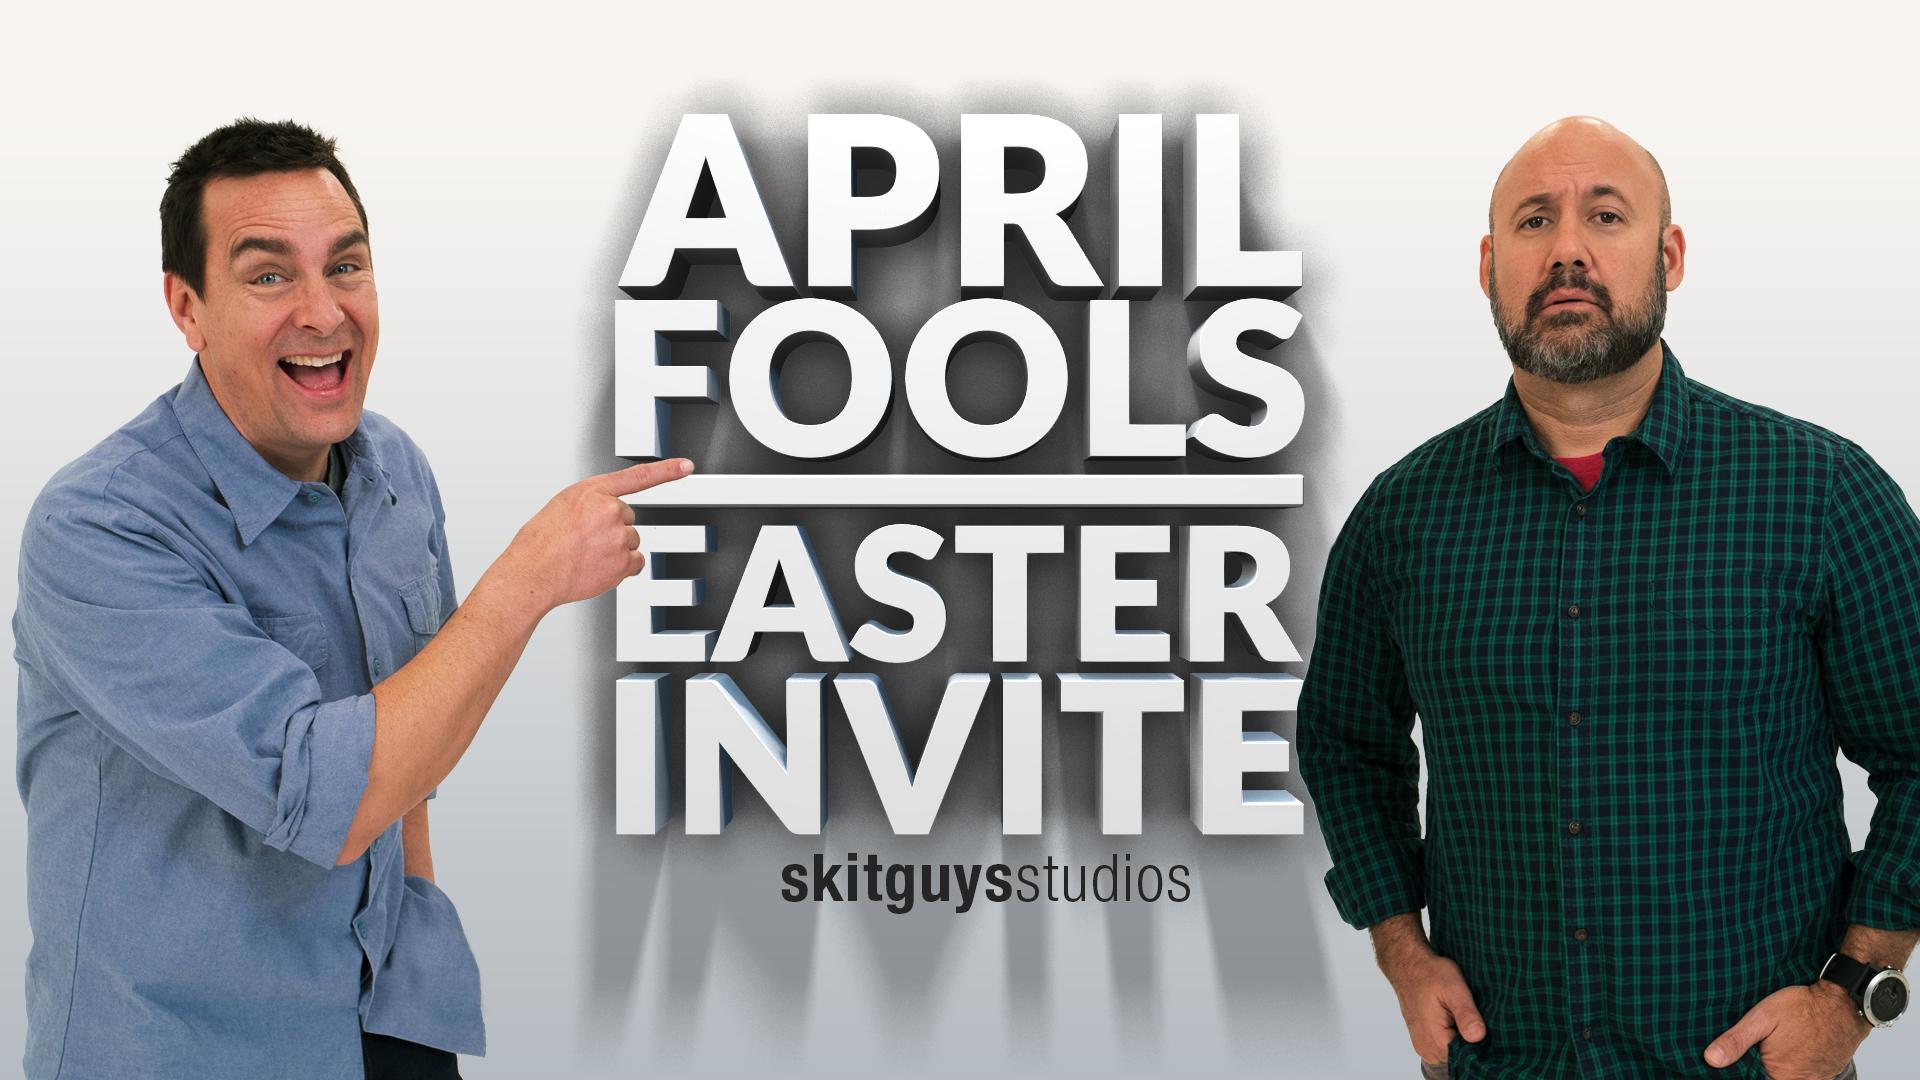 April Fool's Easter Invite